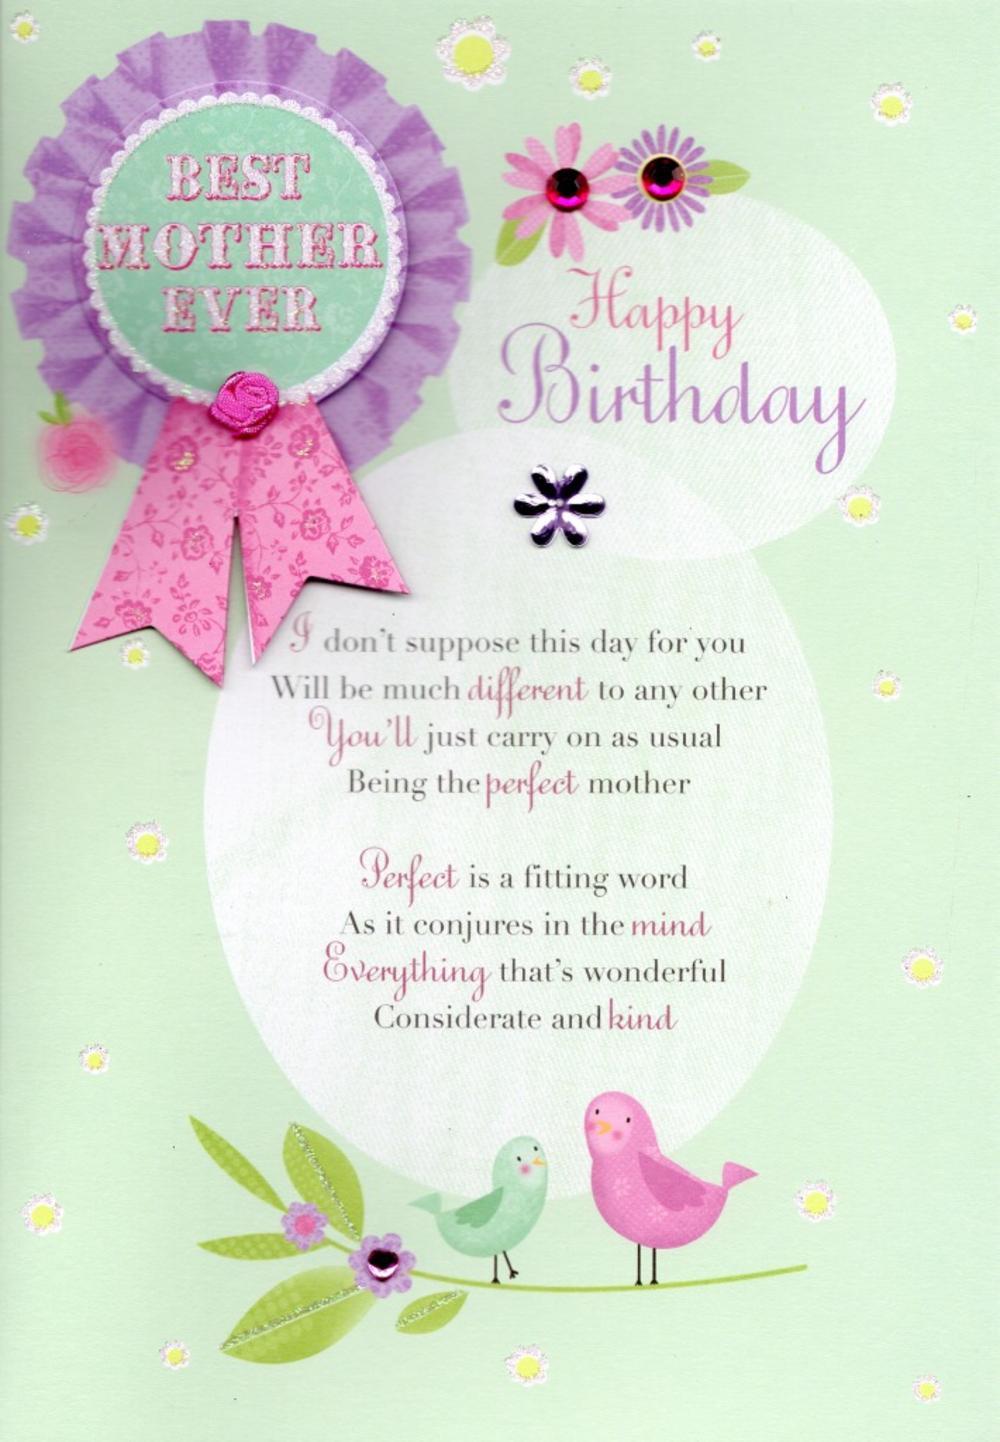 Greetings Birthday Best Mother